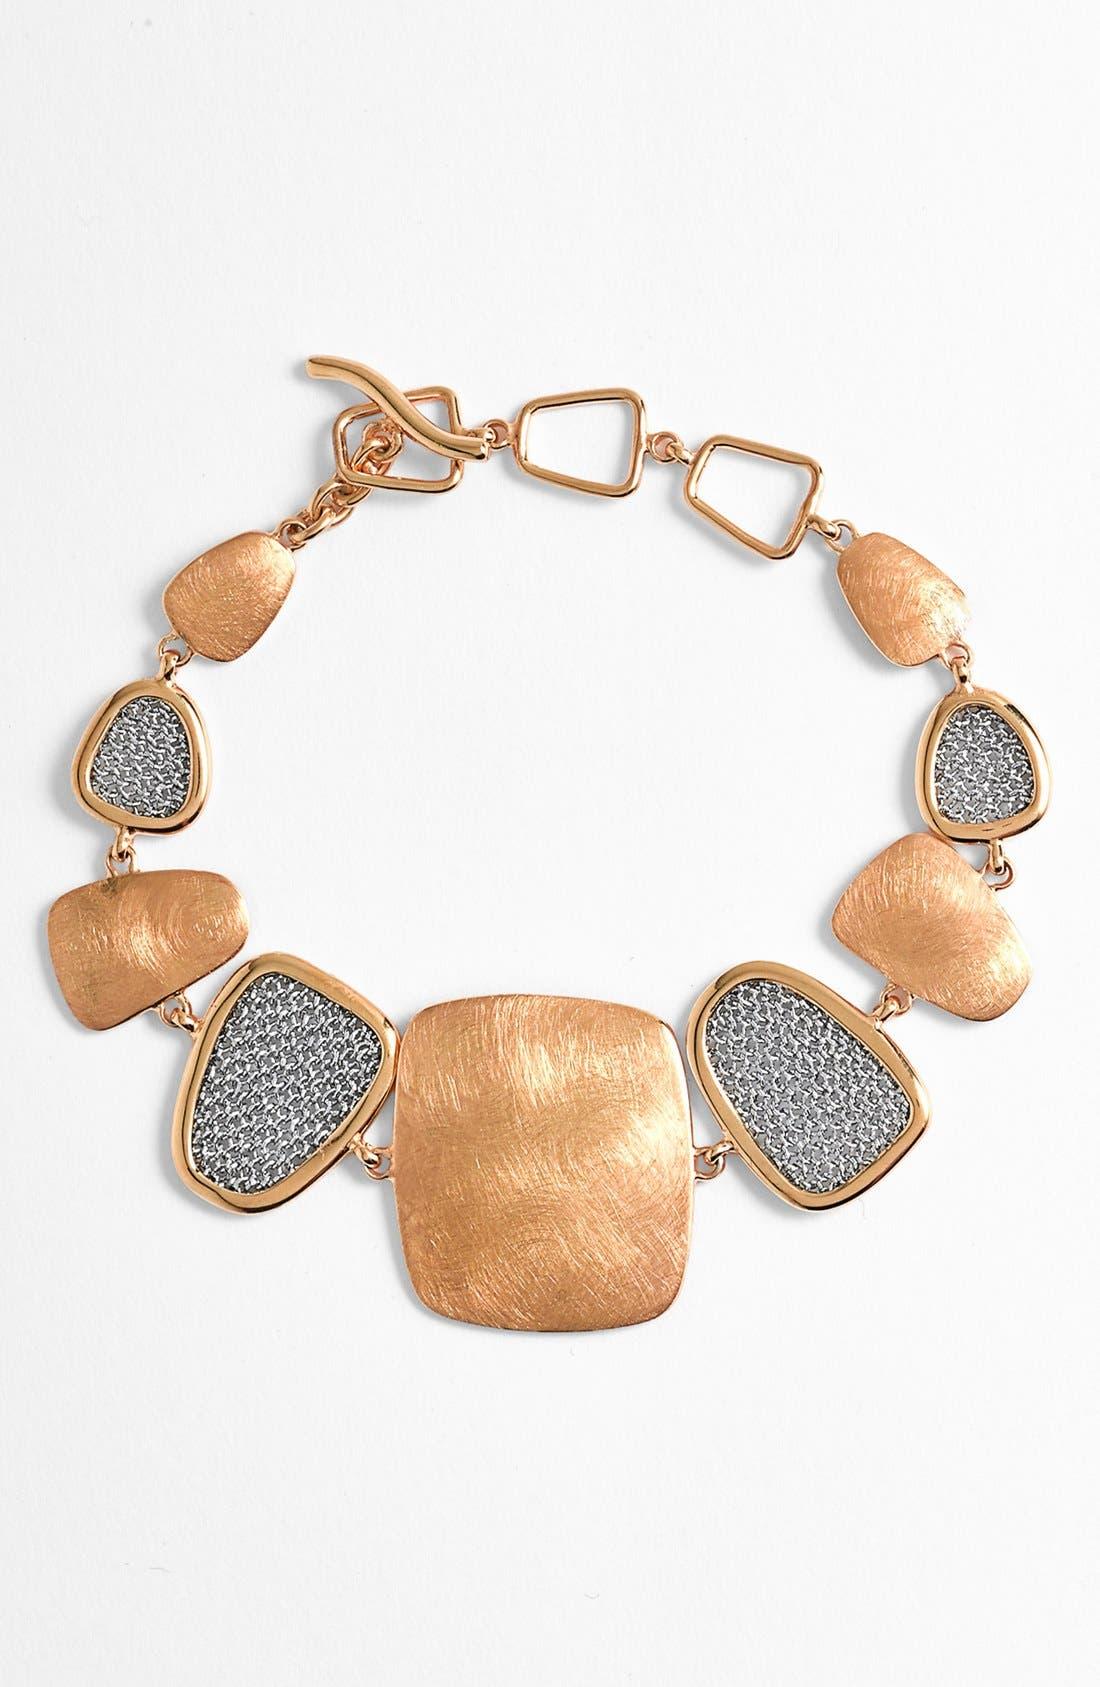 Main Image - Adami & Martucci 'Dune' Toggle Bracelet